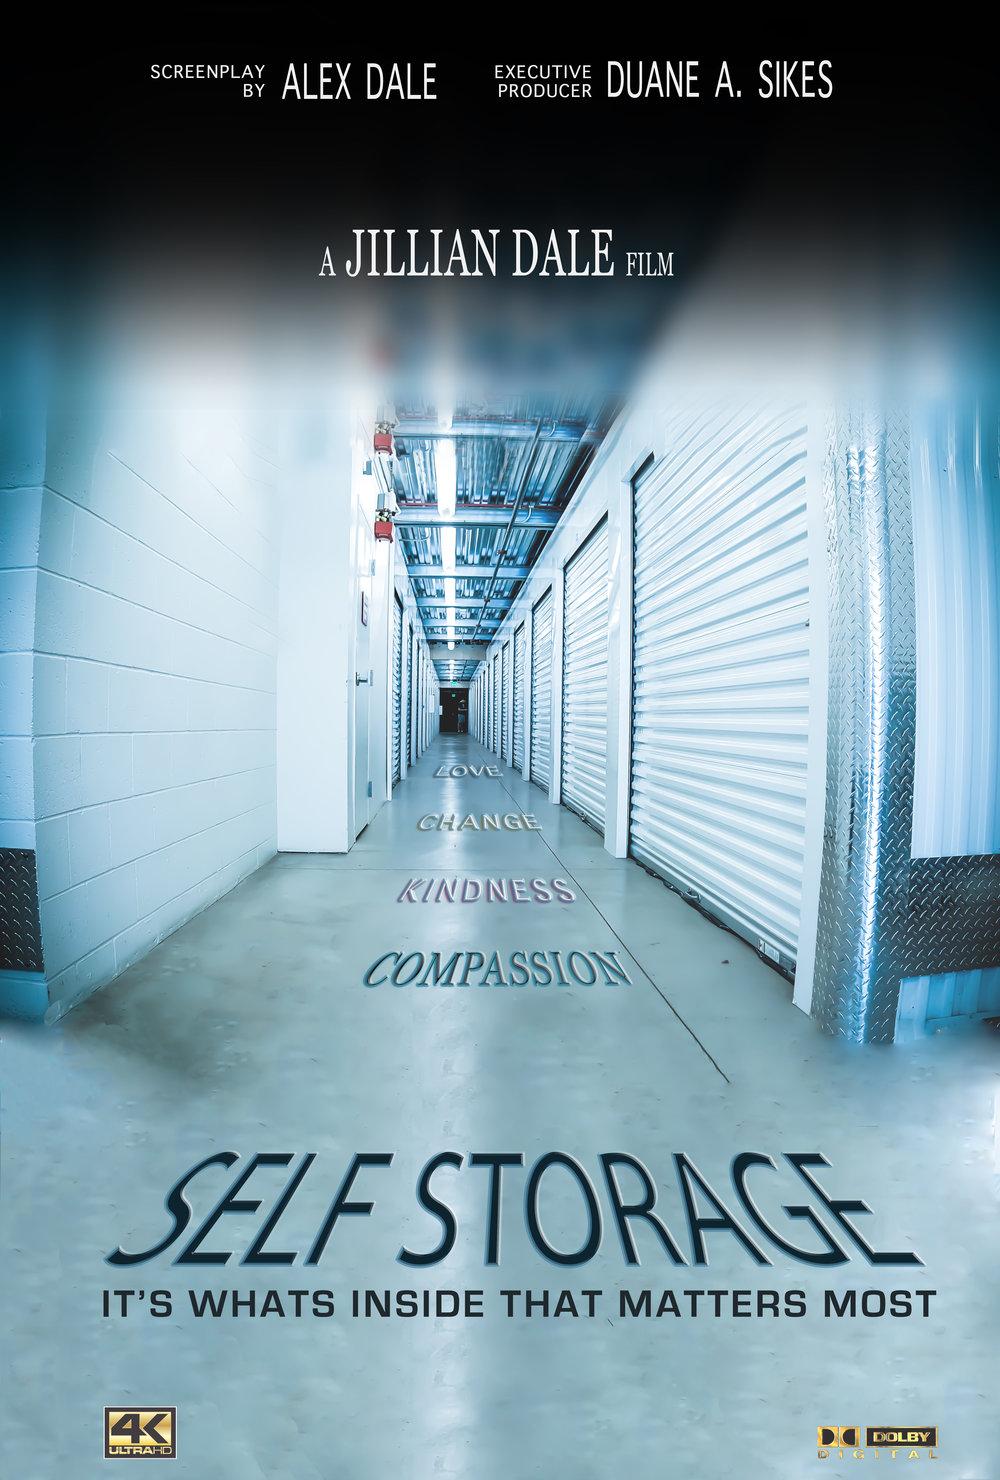 Self Storage Film